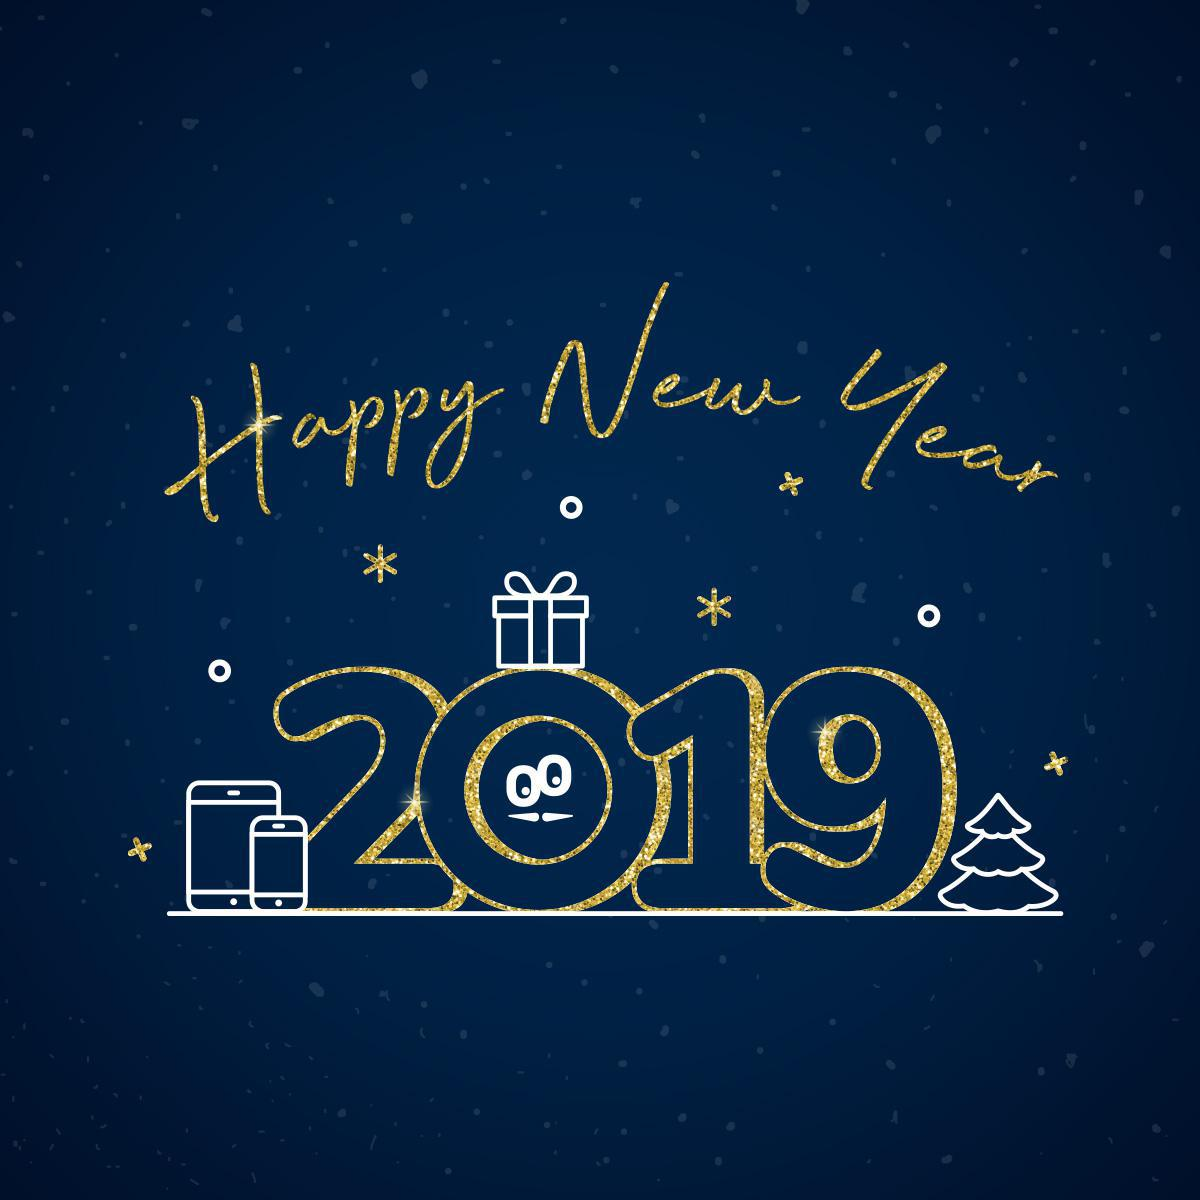 Felice 2019!